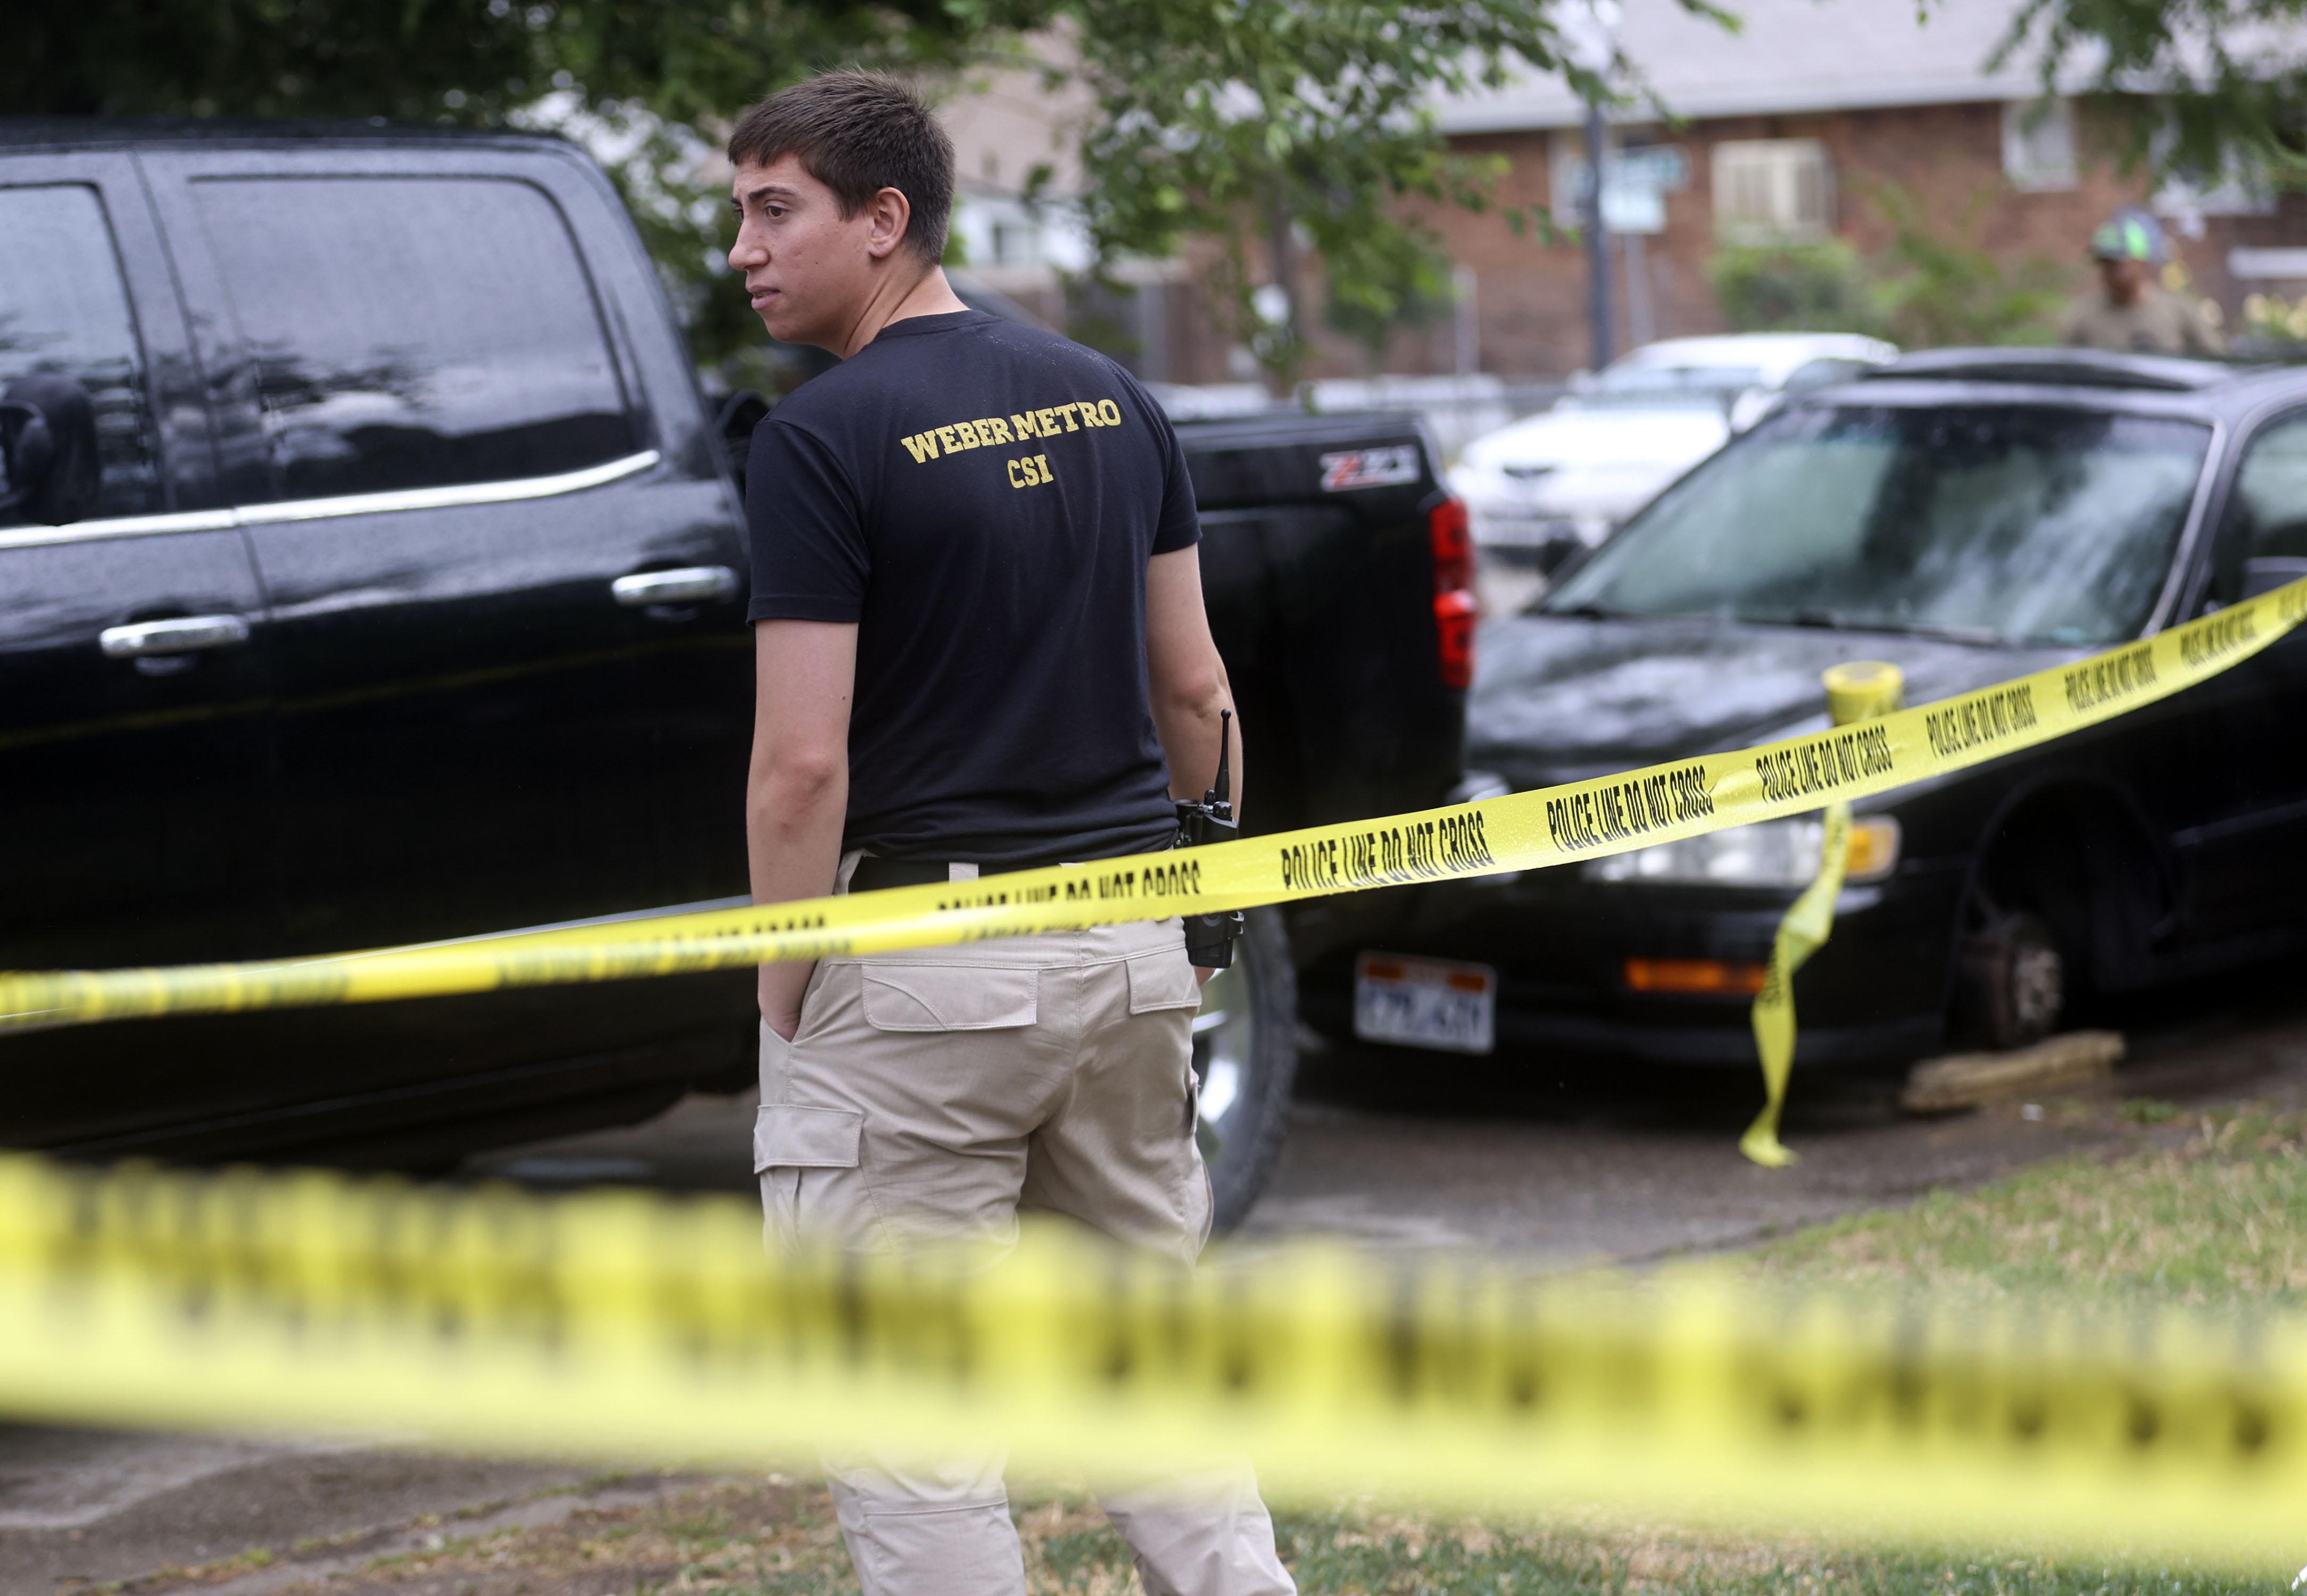 Weber Metro crime scene investigators works at the scene of a shooting on Monroe Boulevard in Ogden.